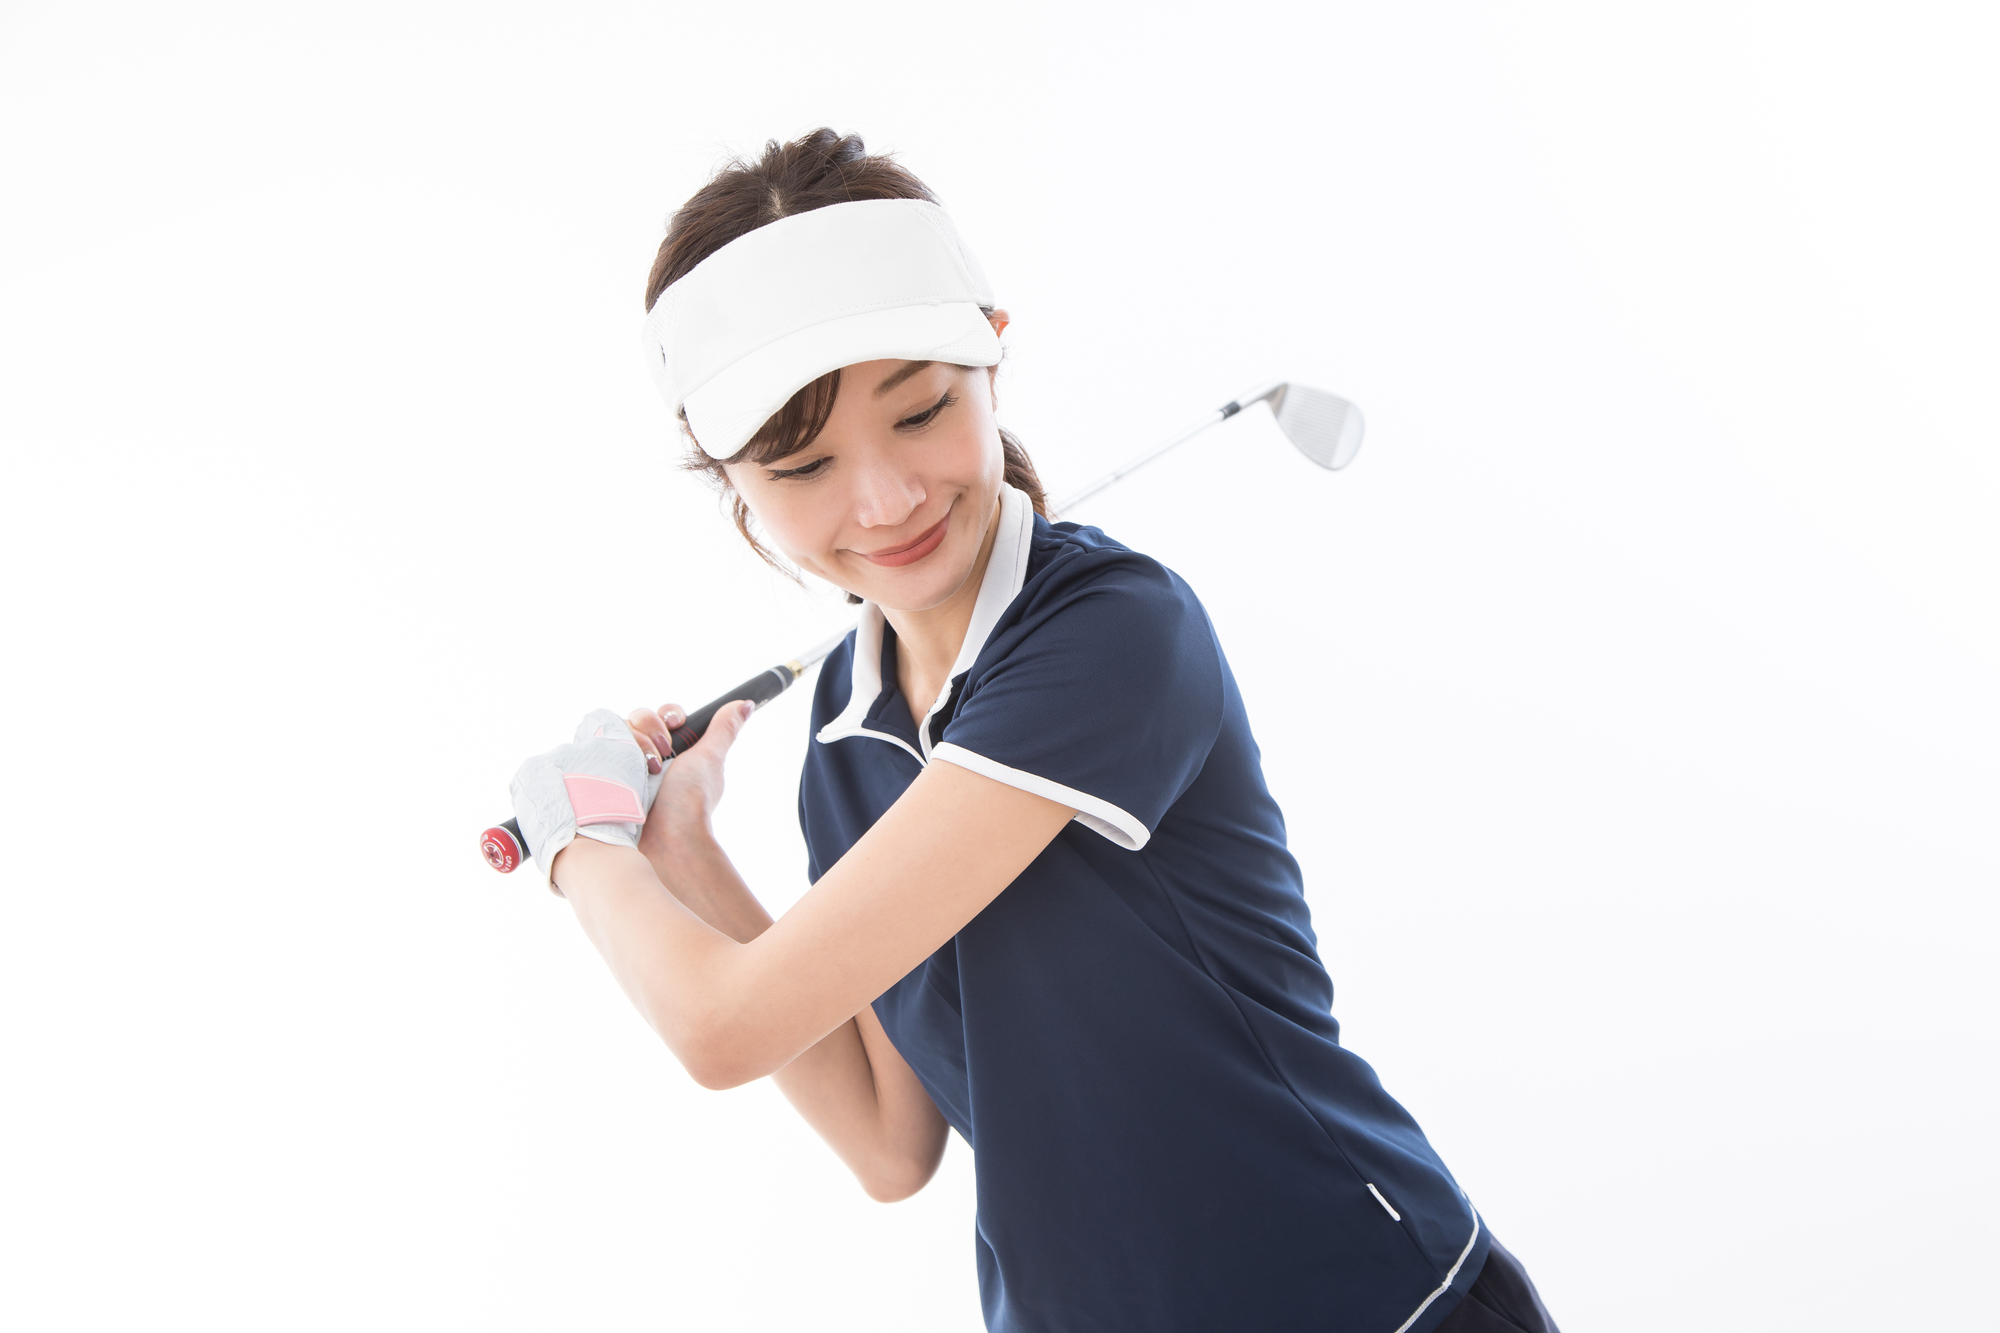 "<span class=""title"">ゴルフスクールでスイング矯正</span>"